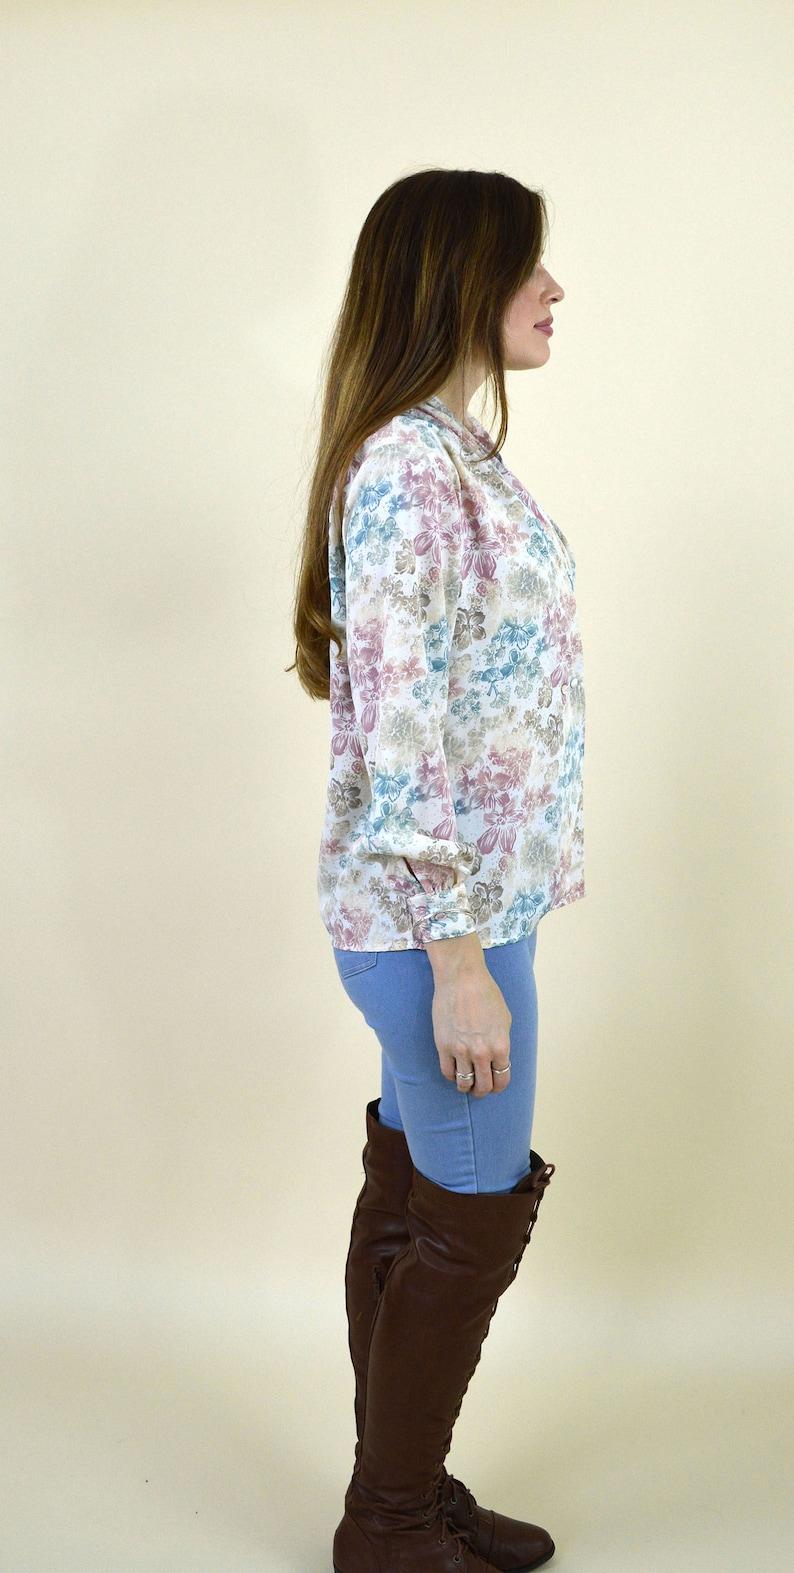 Size Small Mori girl top Vintage 80s cream and pink floral Spring Secretary wrap blouse long sleeve elegant ladies dress shirt